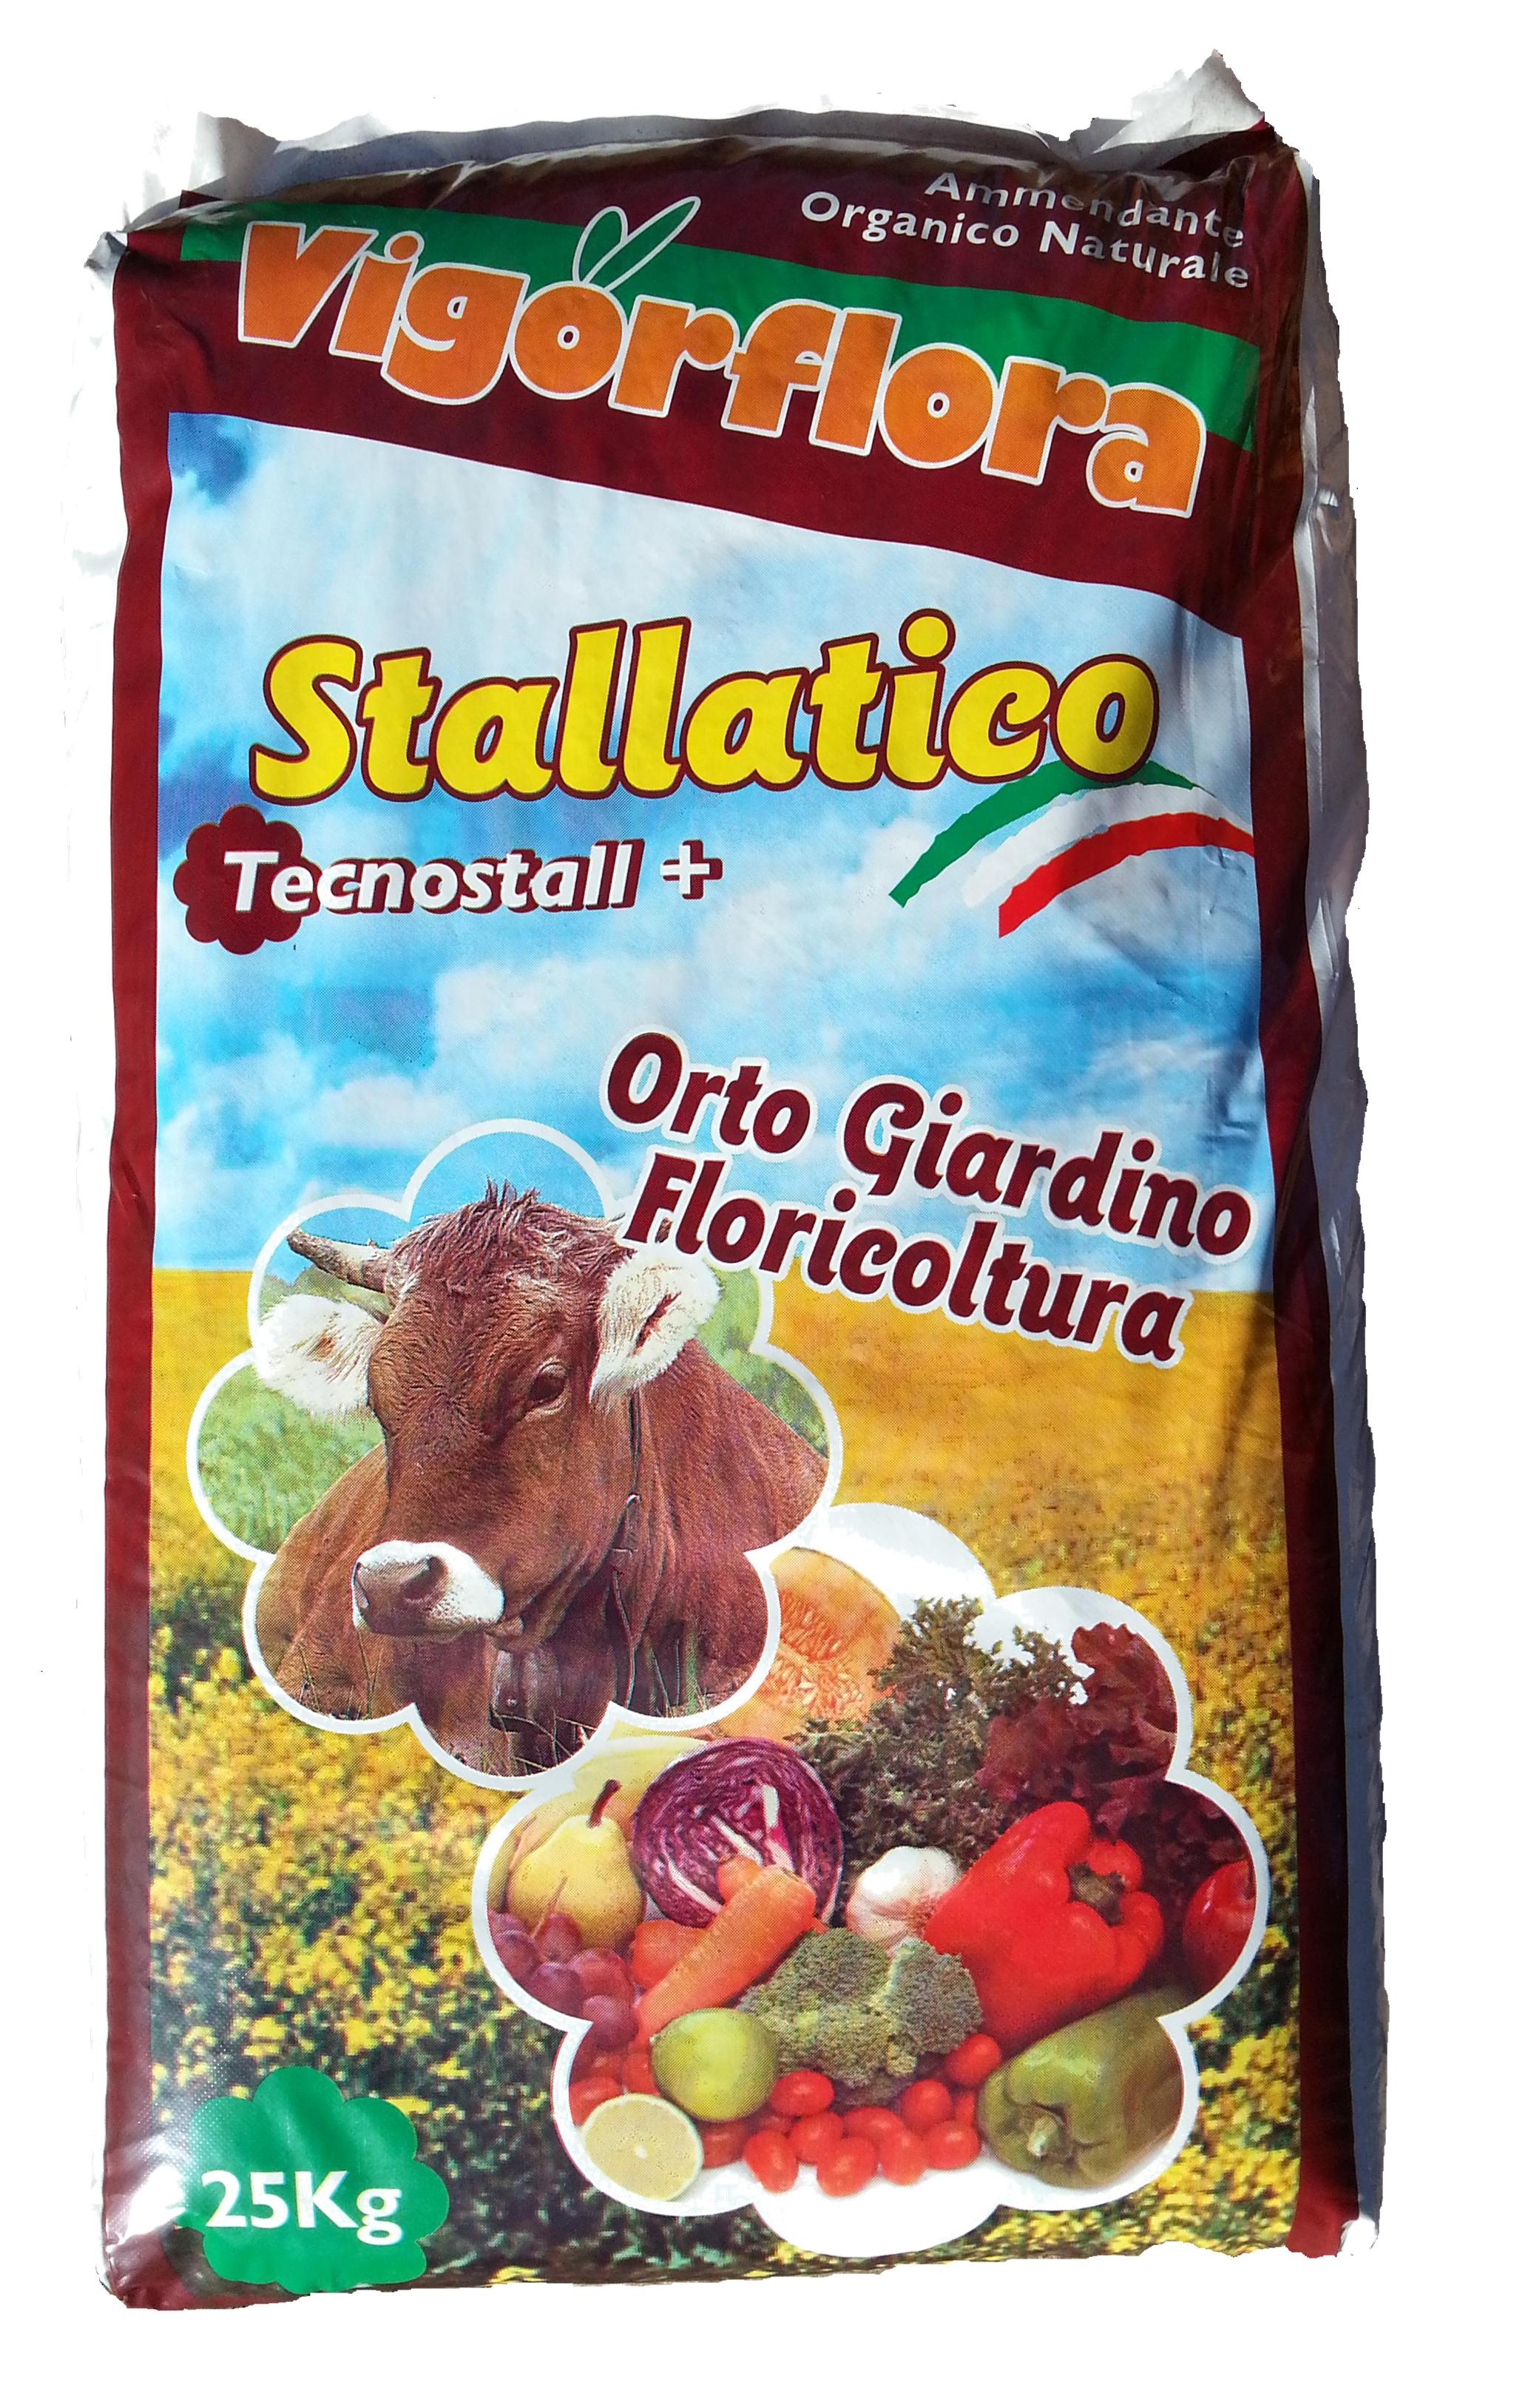 STALLATICO VIGORFLORA 50 LT